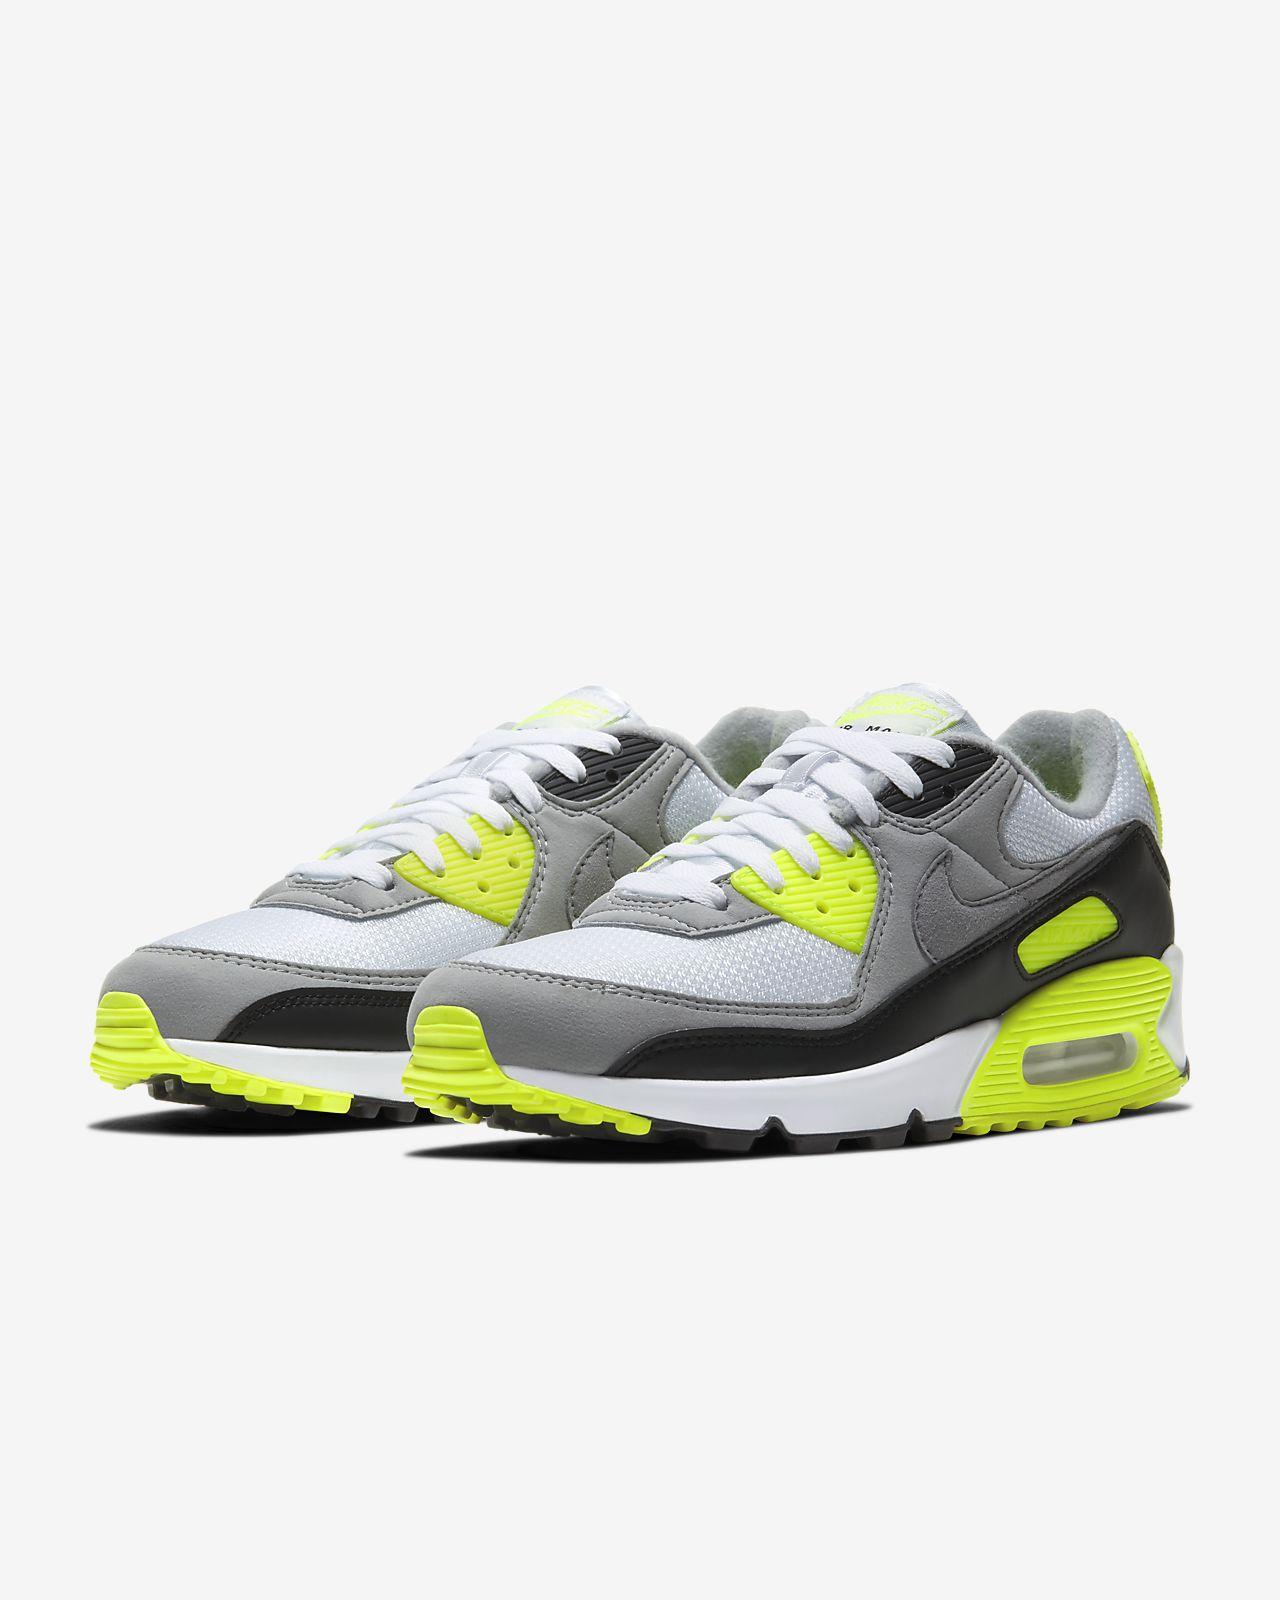 Nike Air Max 90 Drip or No Drip Sneakers